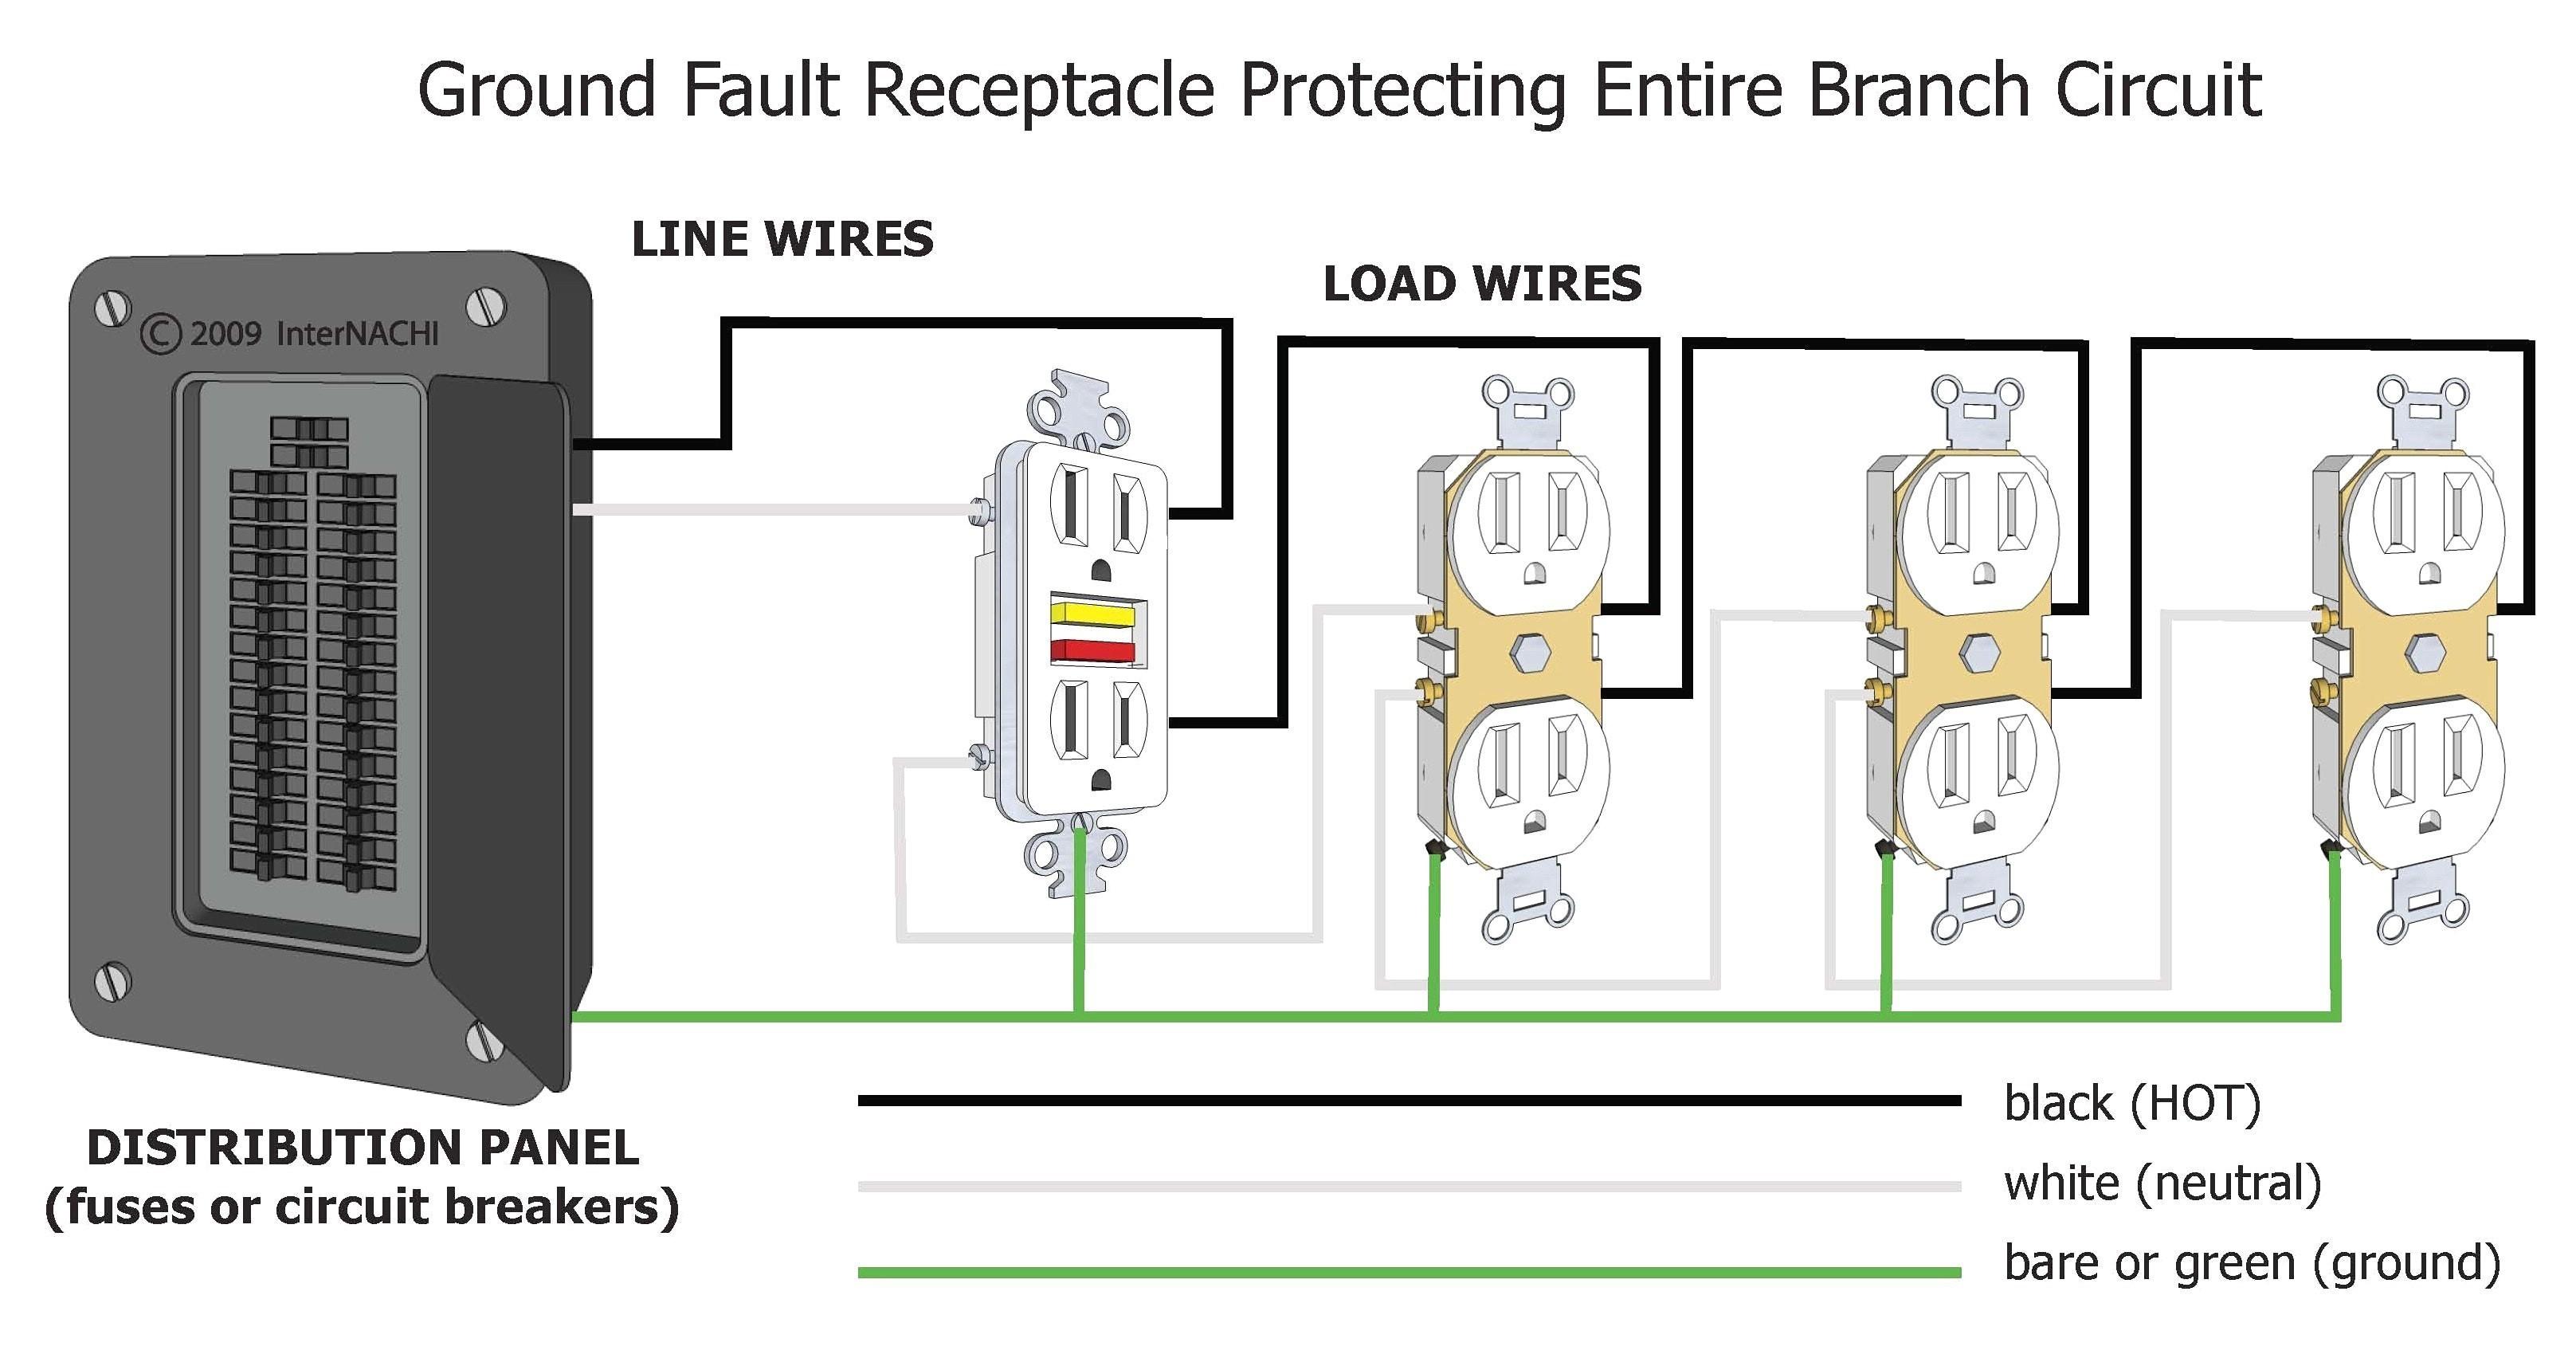 50 Amp Sub Panel Wiring Diagram Wiring Diagram for Amp Installation Best 60 Amp Sub Panel